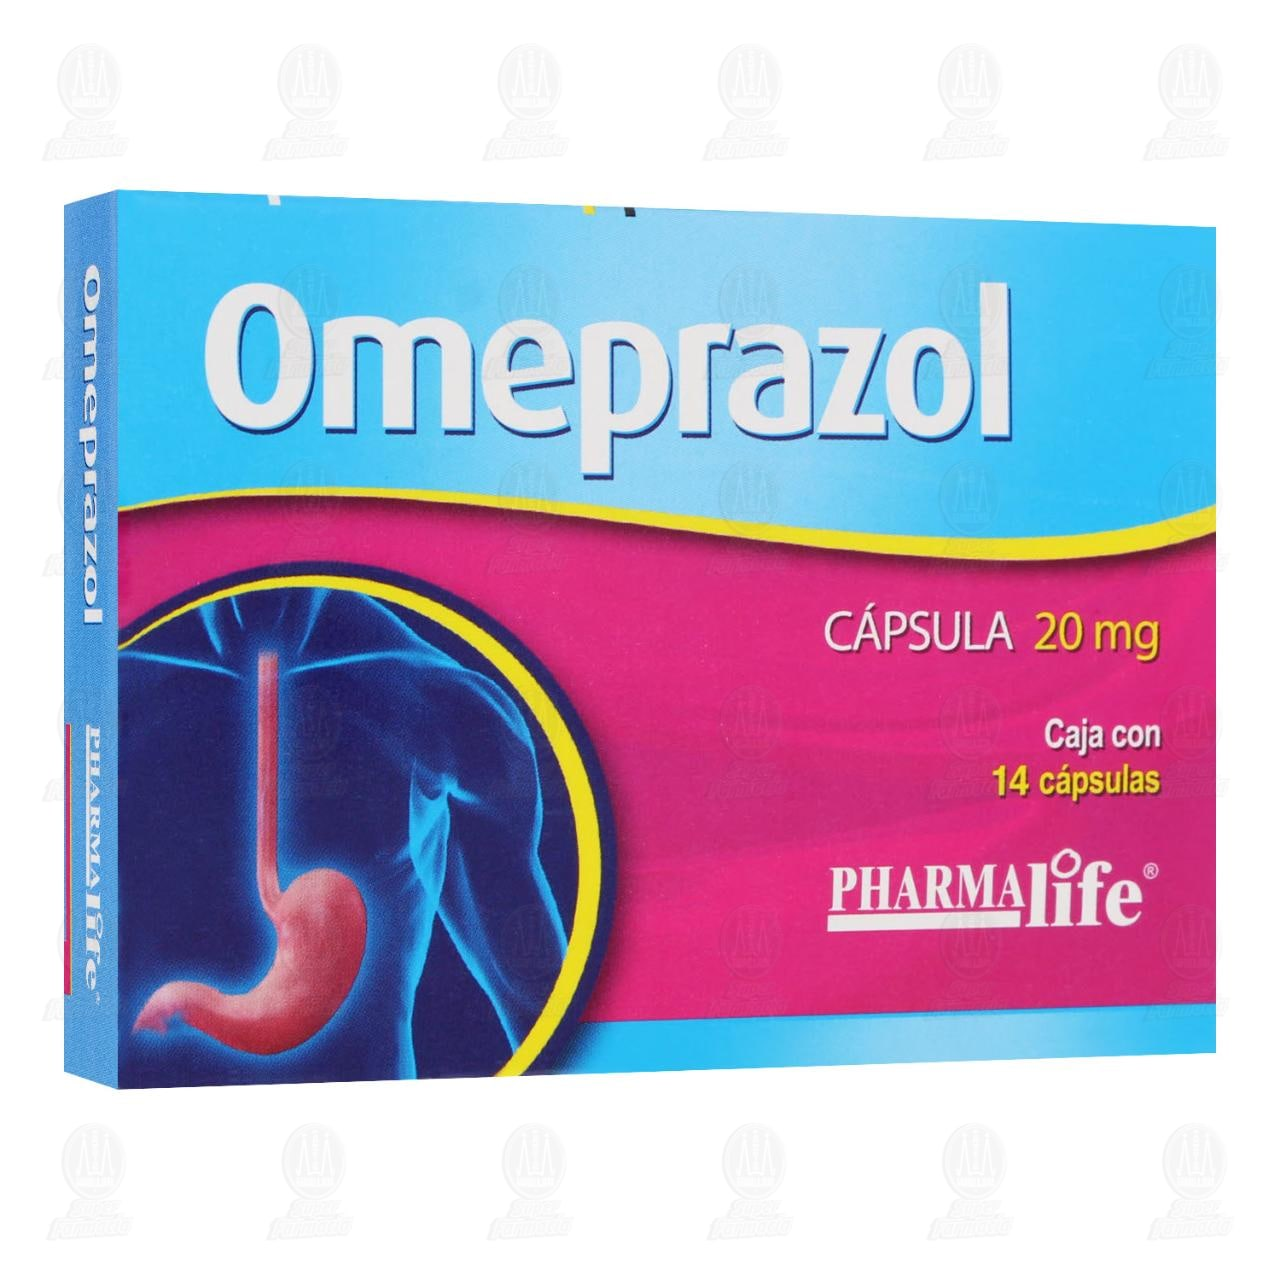 Comprar Omeprazol 20 mg 14 Cápsulas Pharmalife en Farmacias Guadalajara